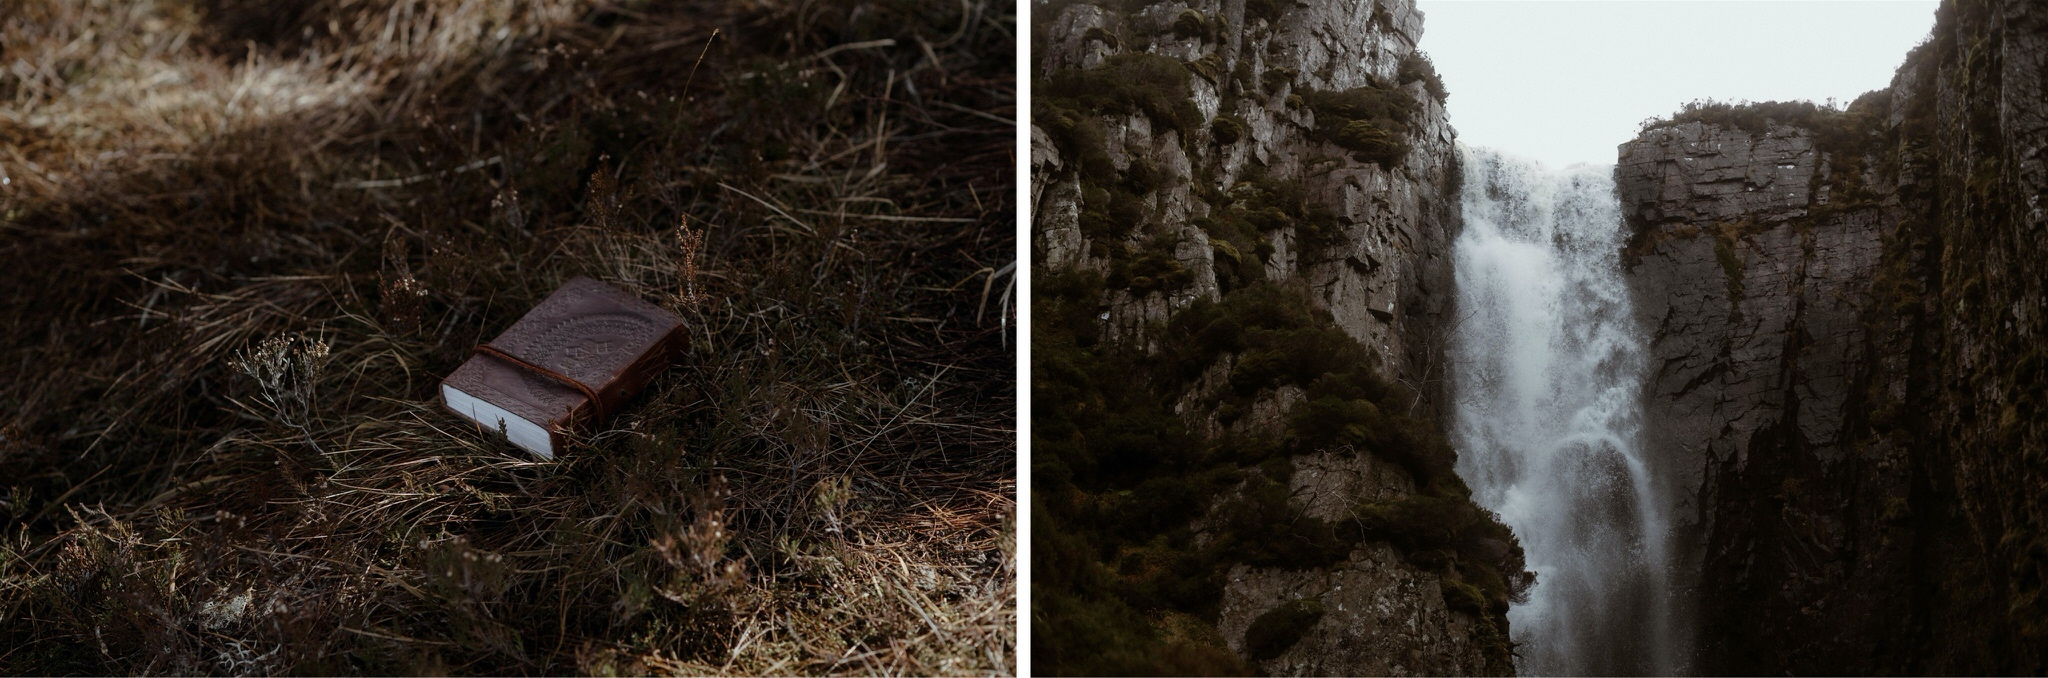 Detail shot of a waterfall in Assynt, Scotland